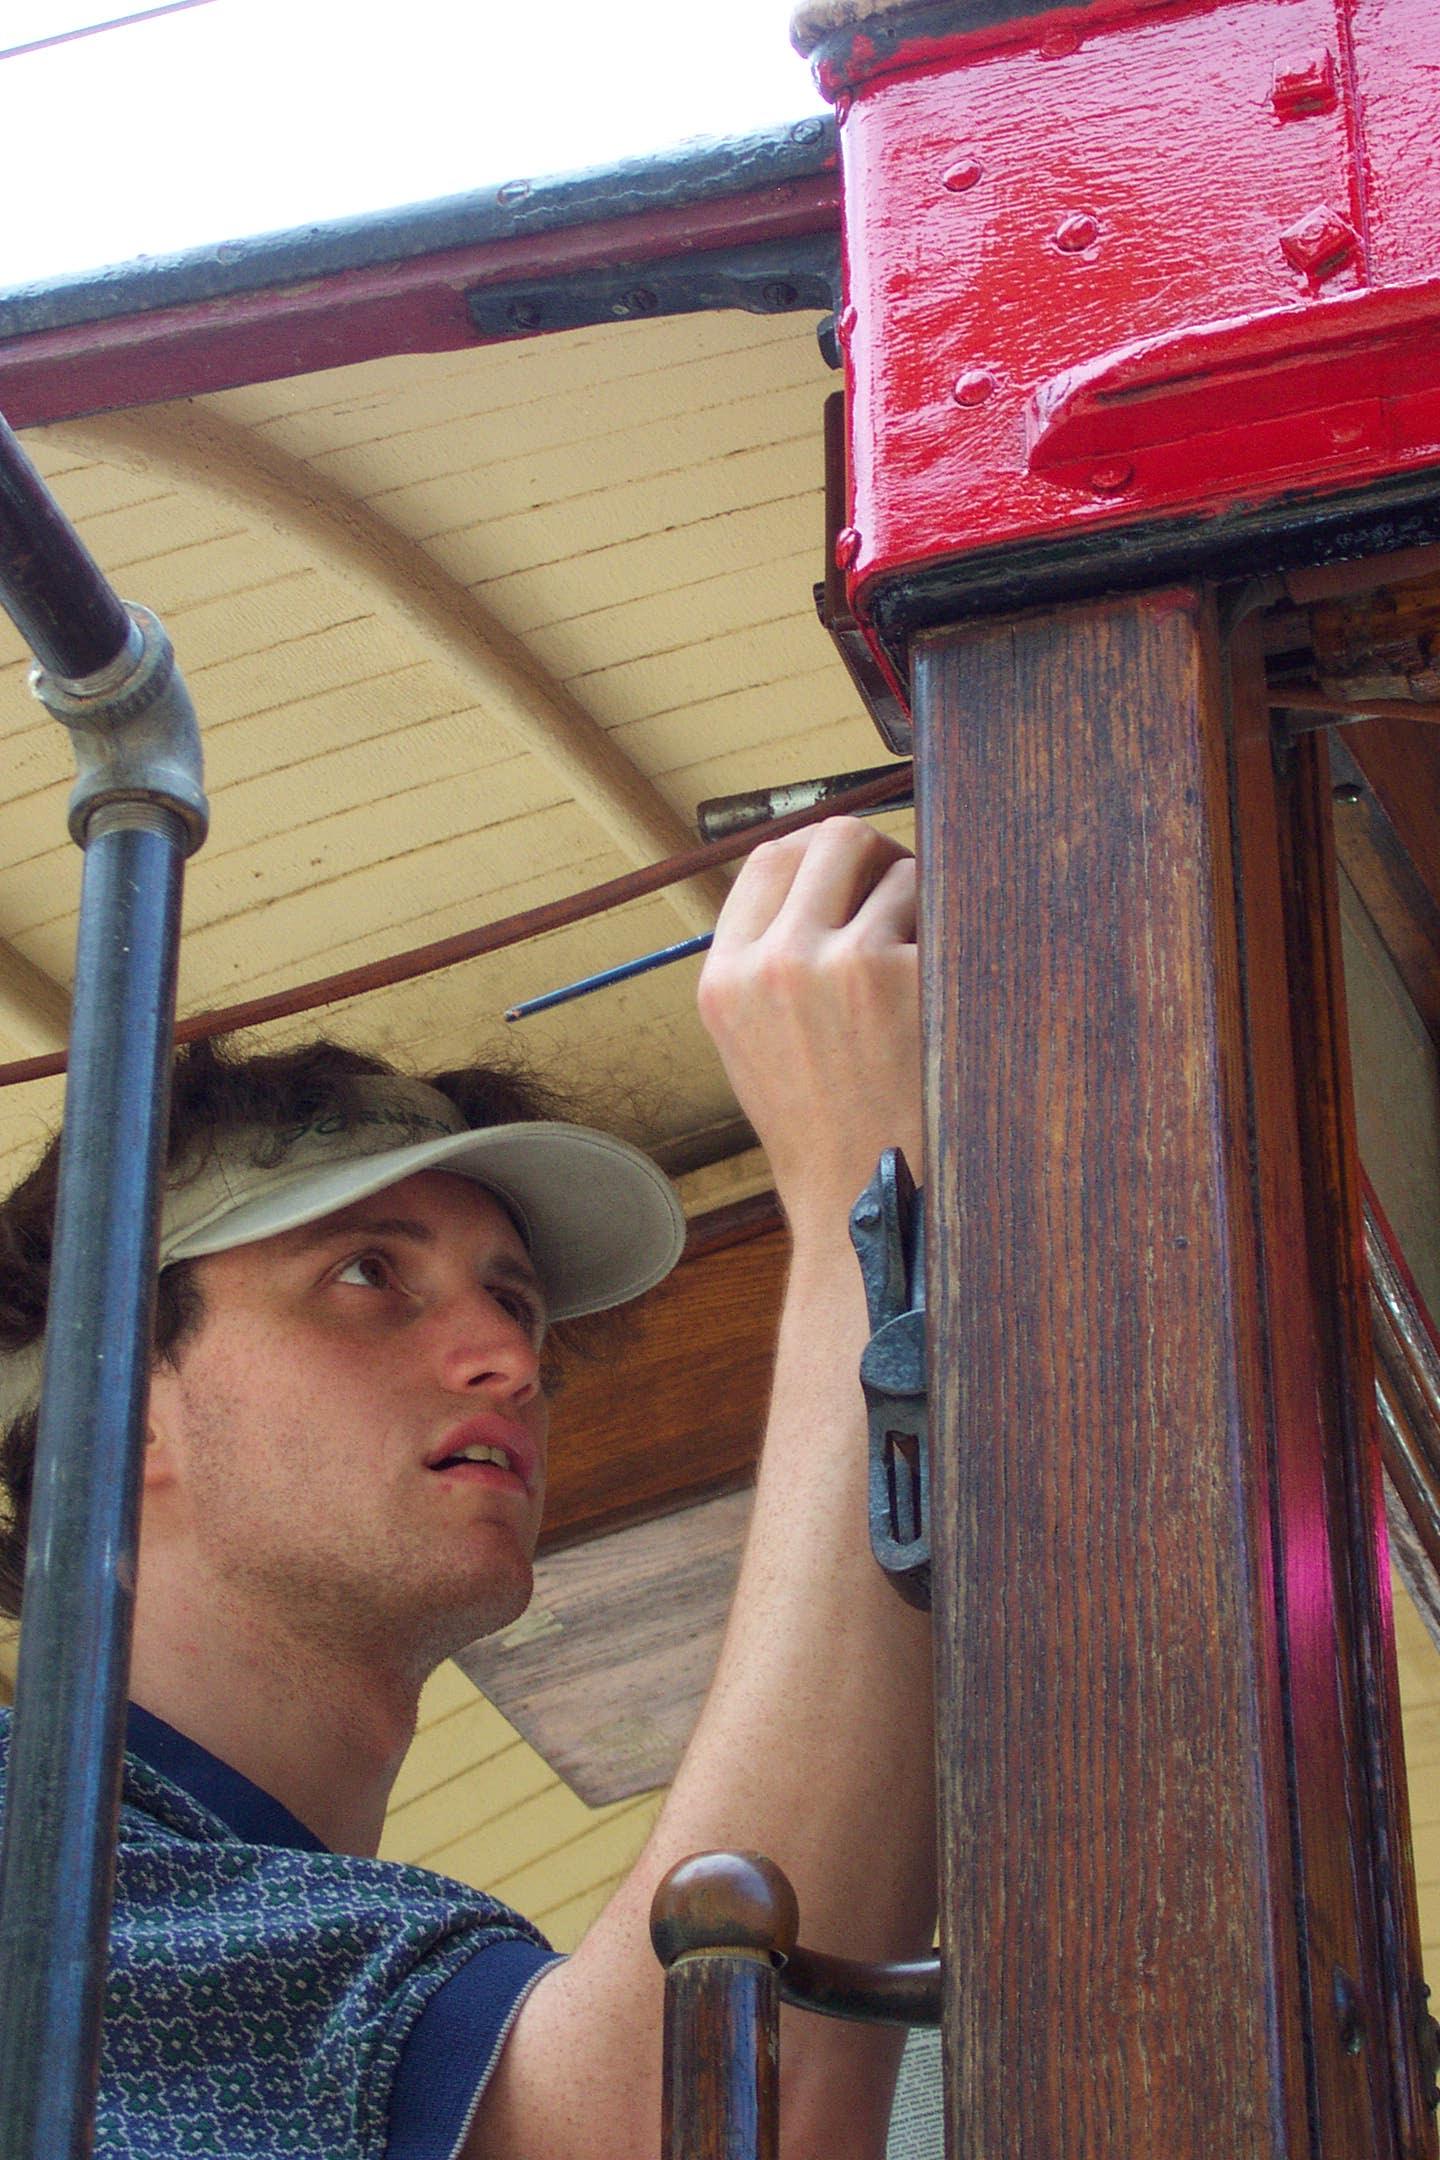 BSM Member Justin Thillman Working on collection car 554. Image Credit: John La Costa